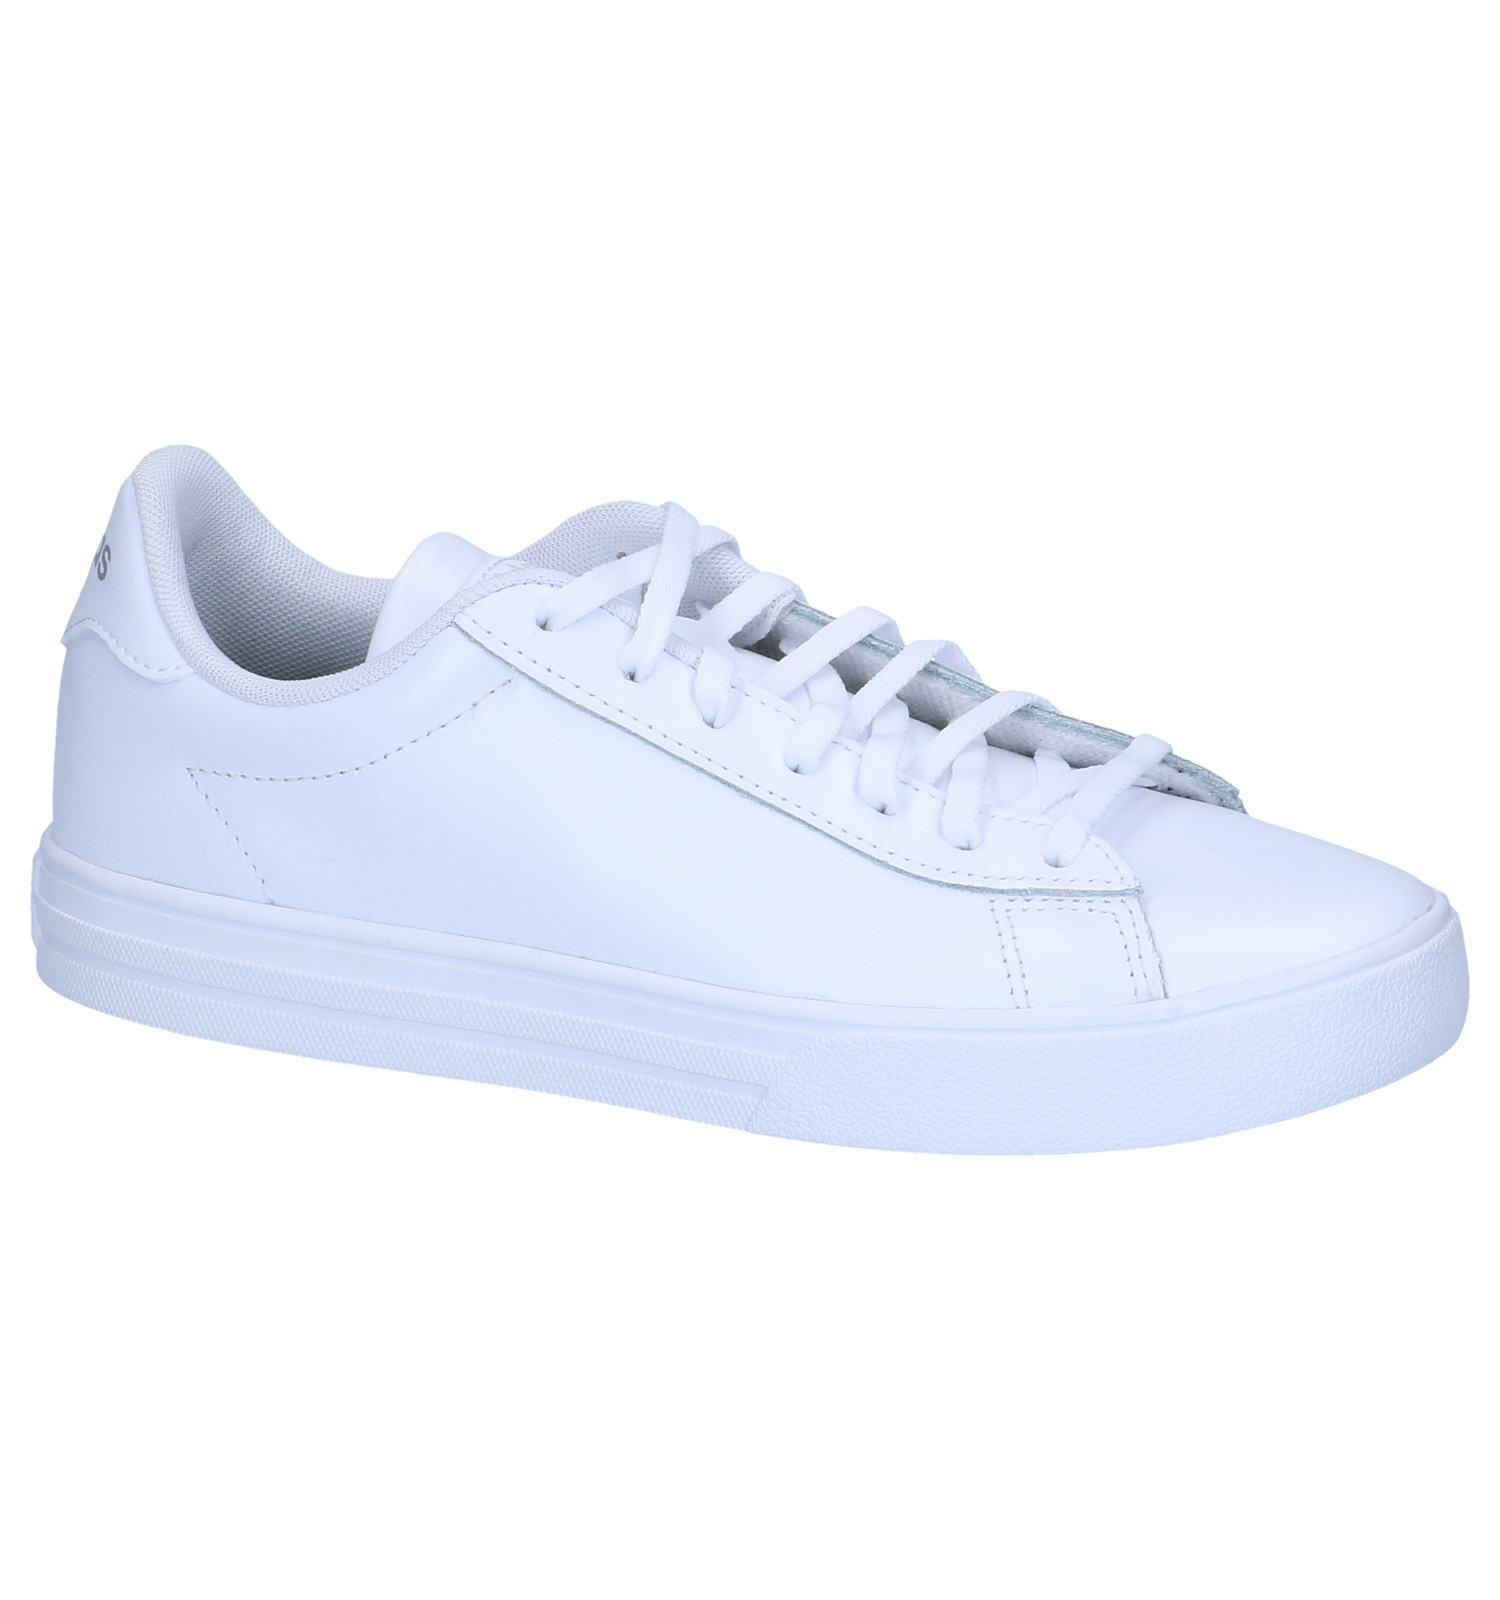 Witte Sneakers adidas Daily 2.0   SCHOENENTORFS.NL   Gratis verzend en retour